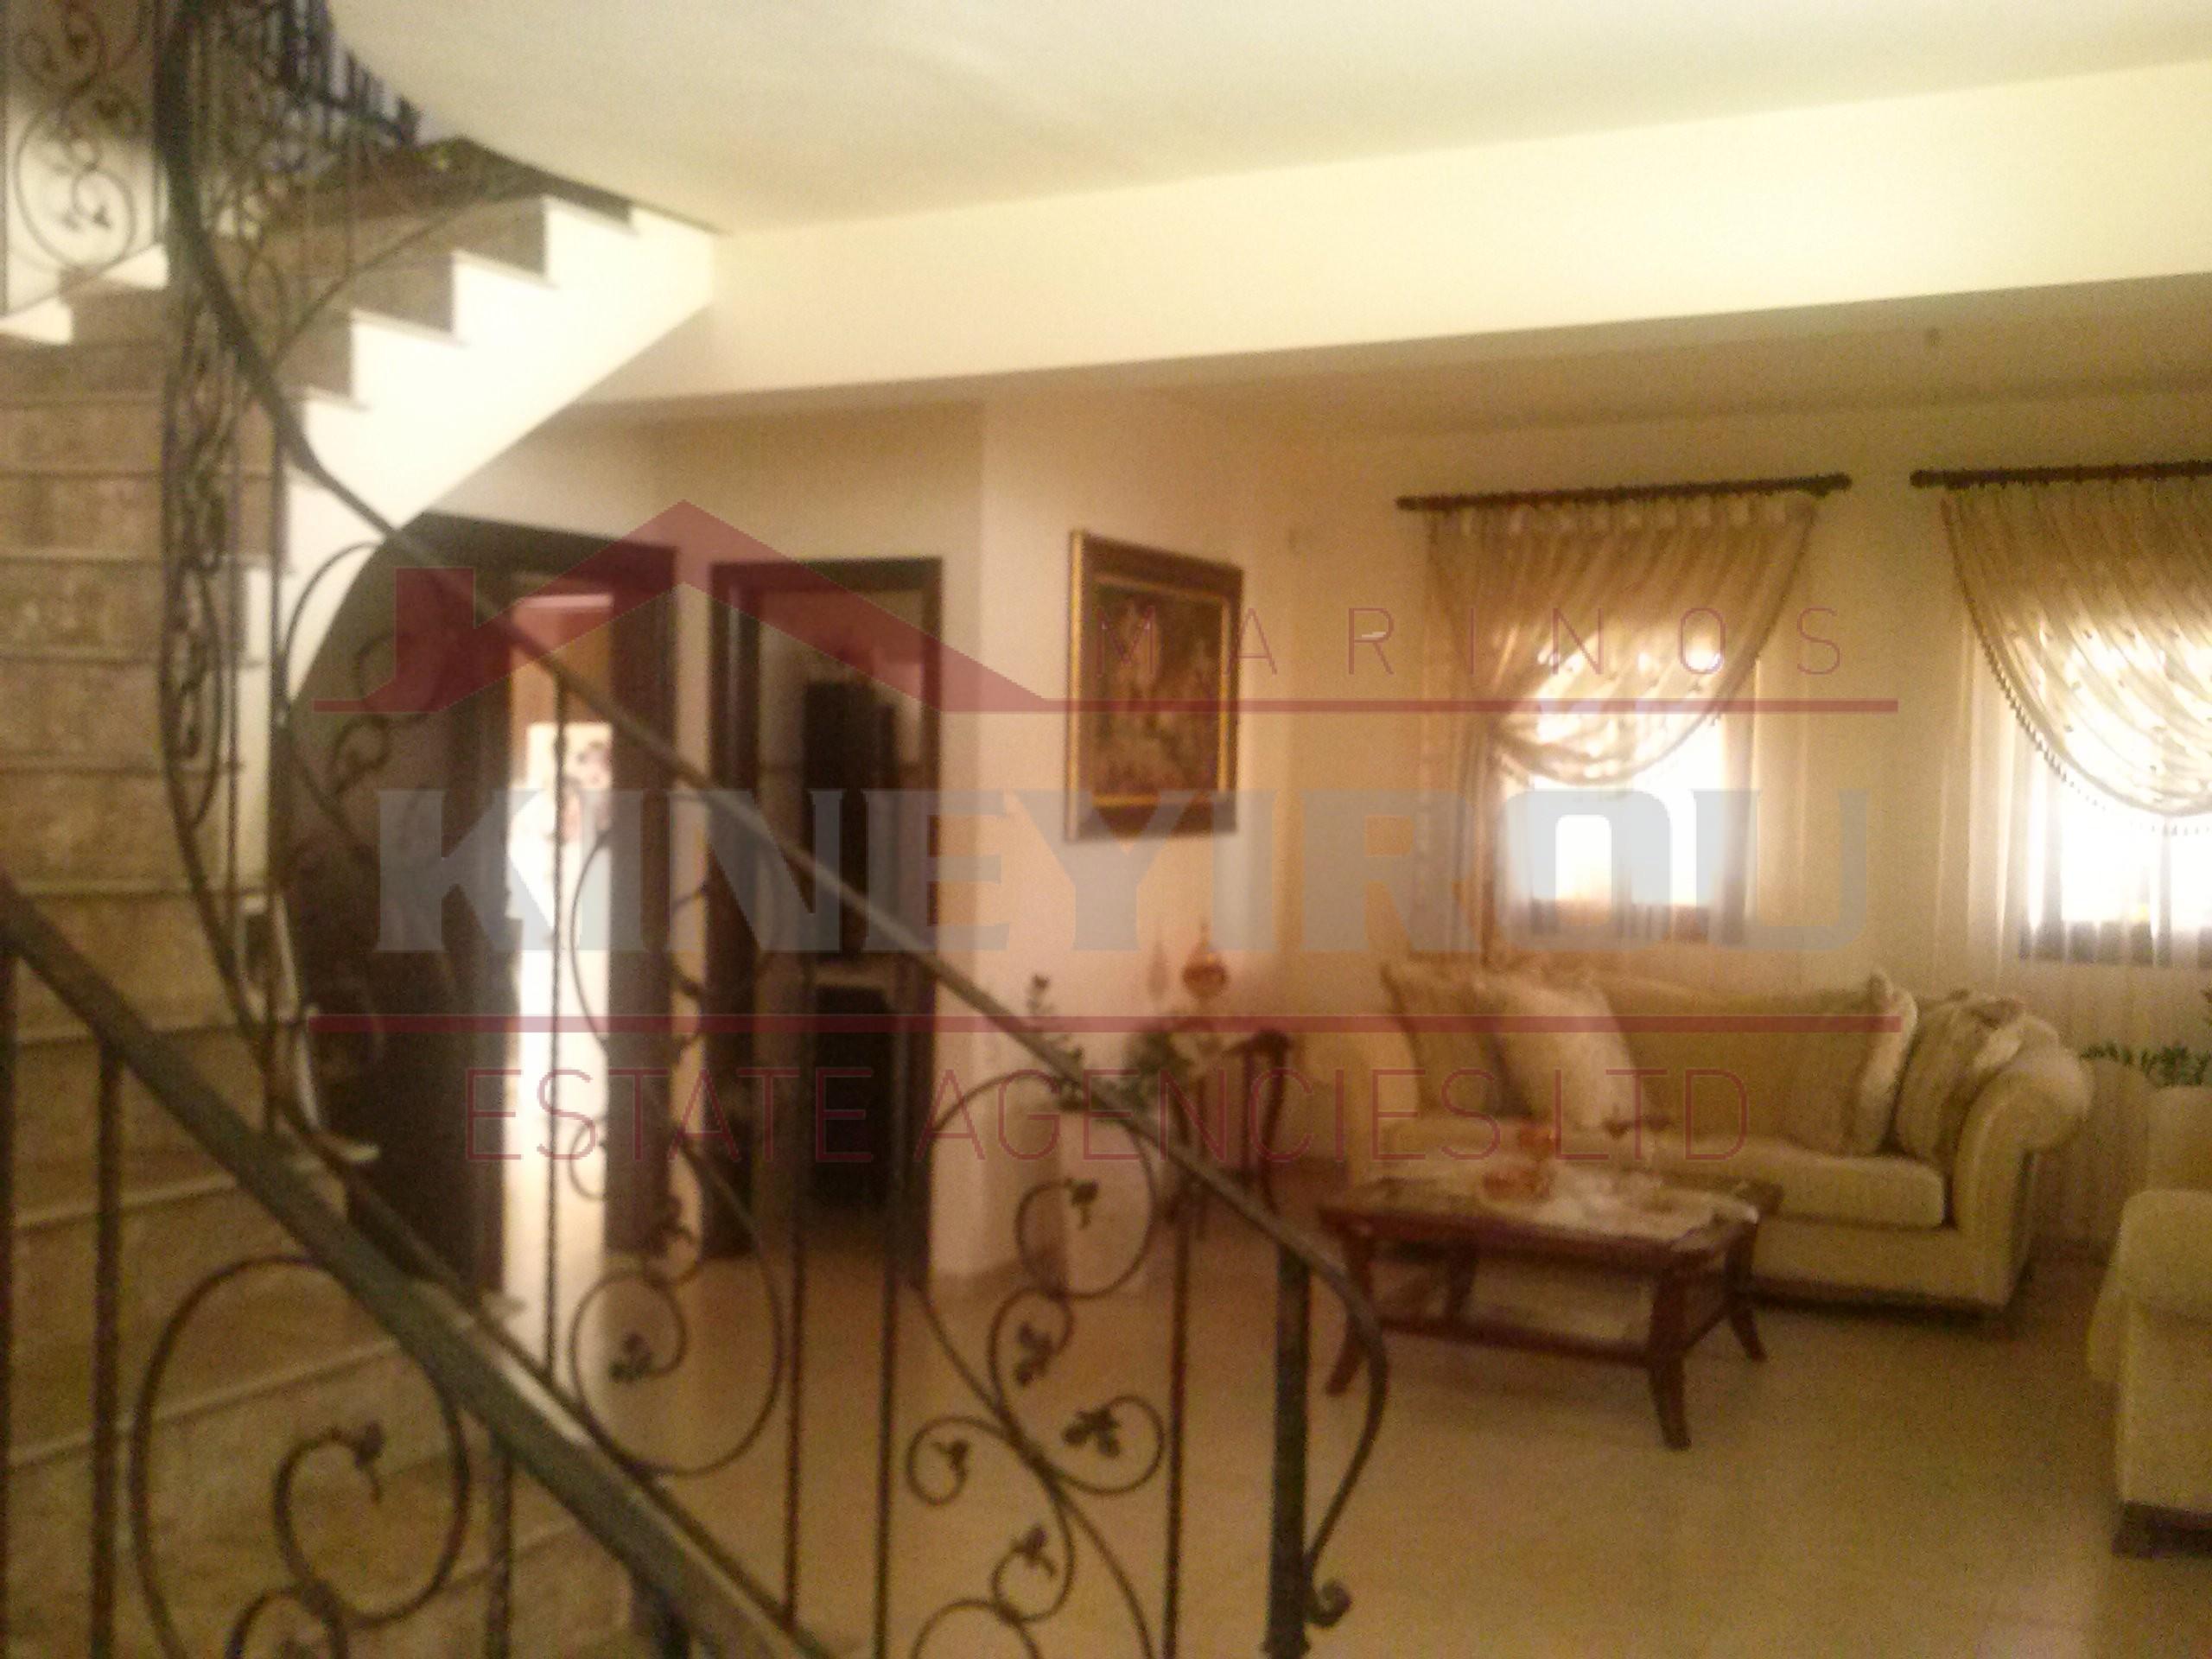 4 bedroom house  in Tersefanou , Larnaca